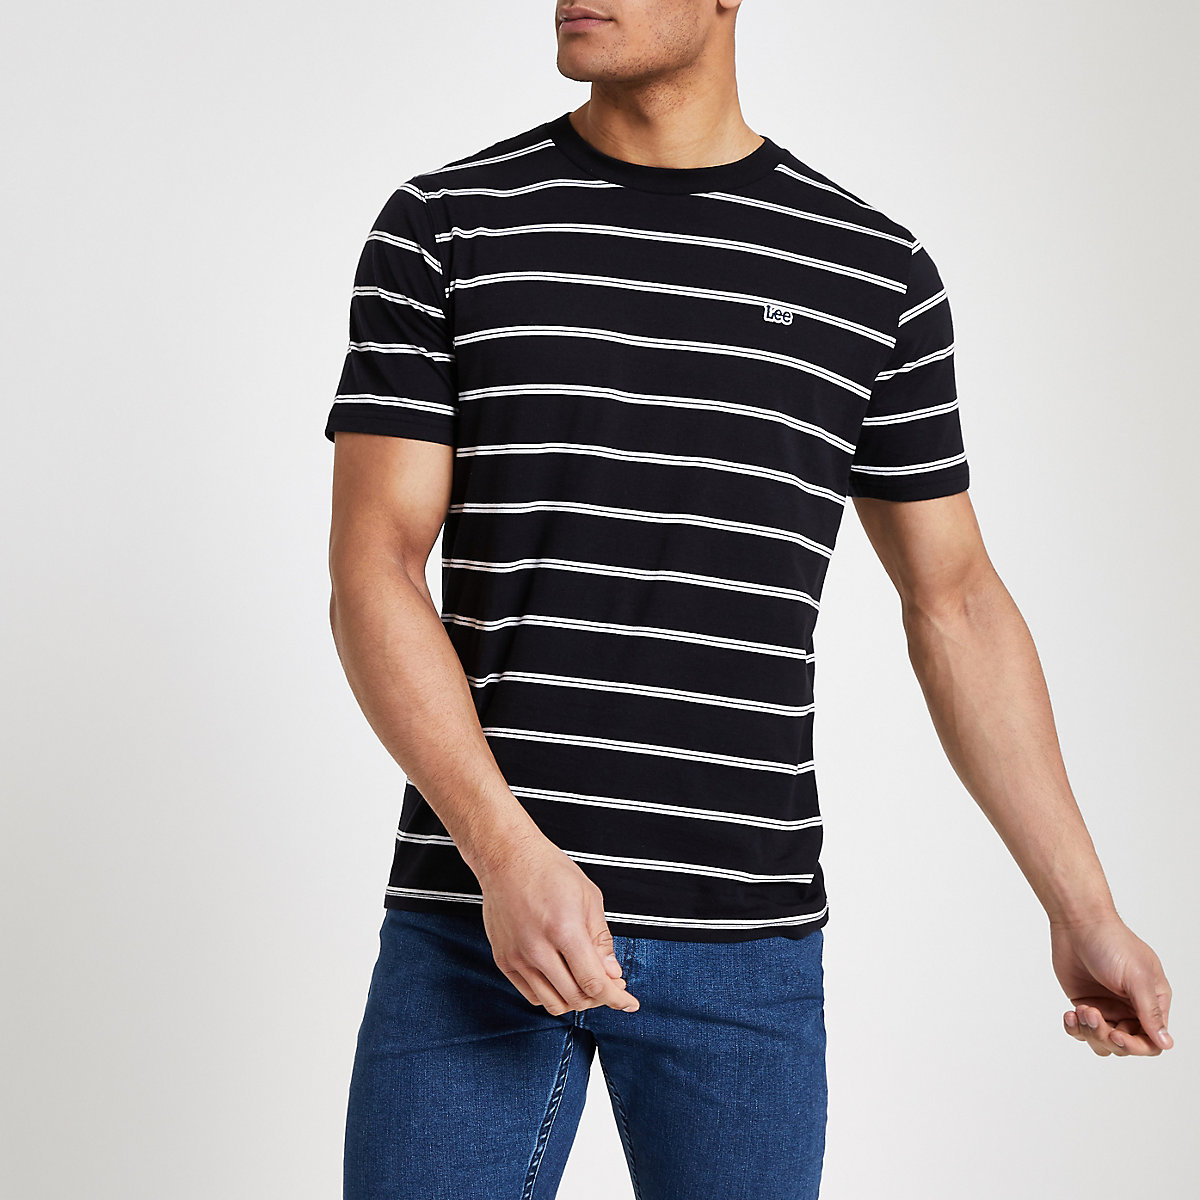 Lee black stripe T-shirt